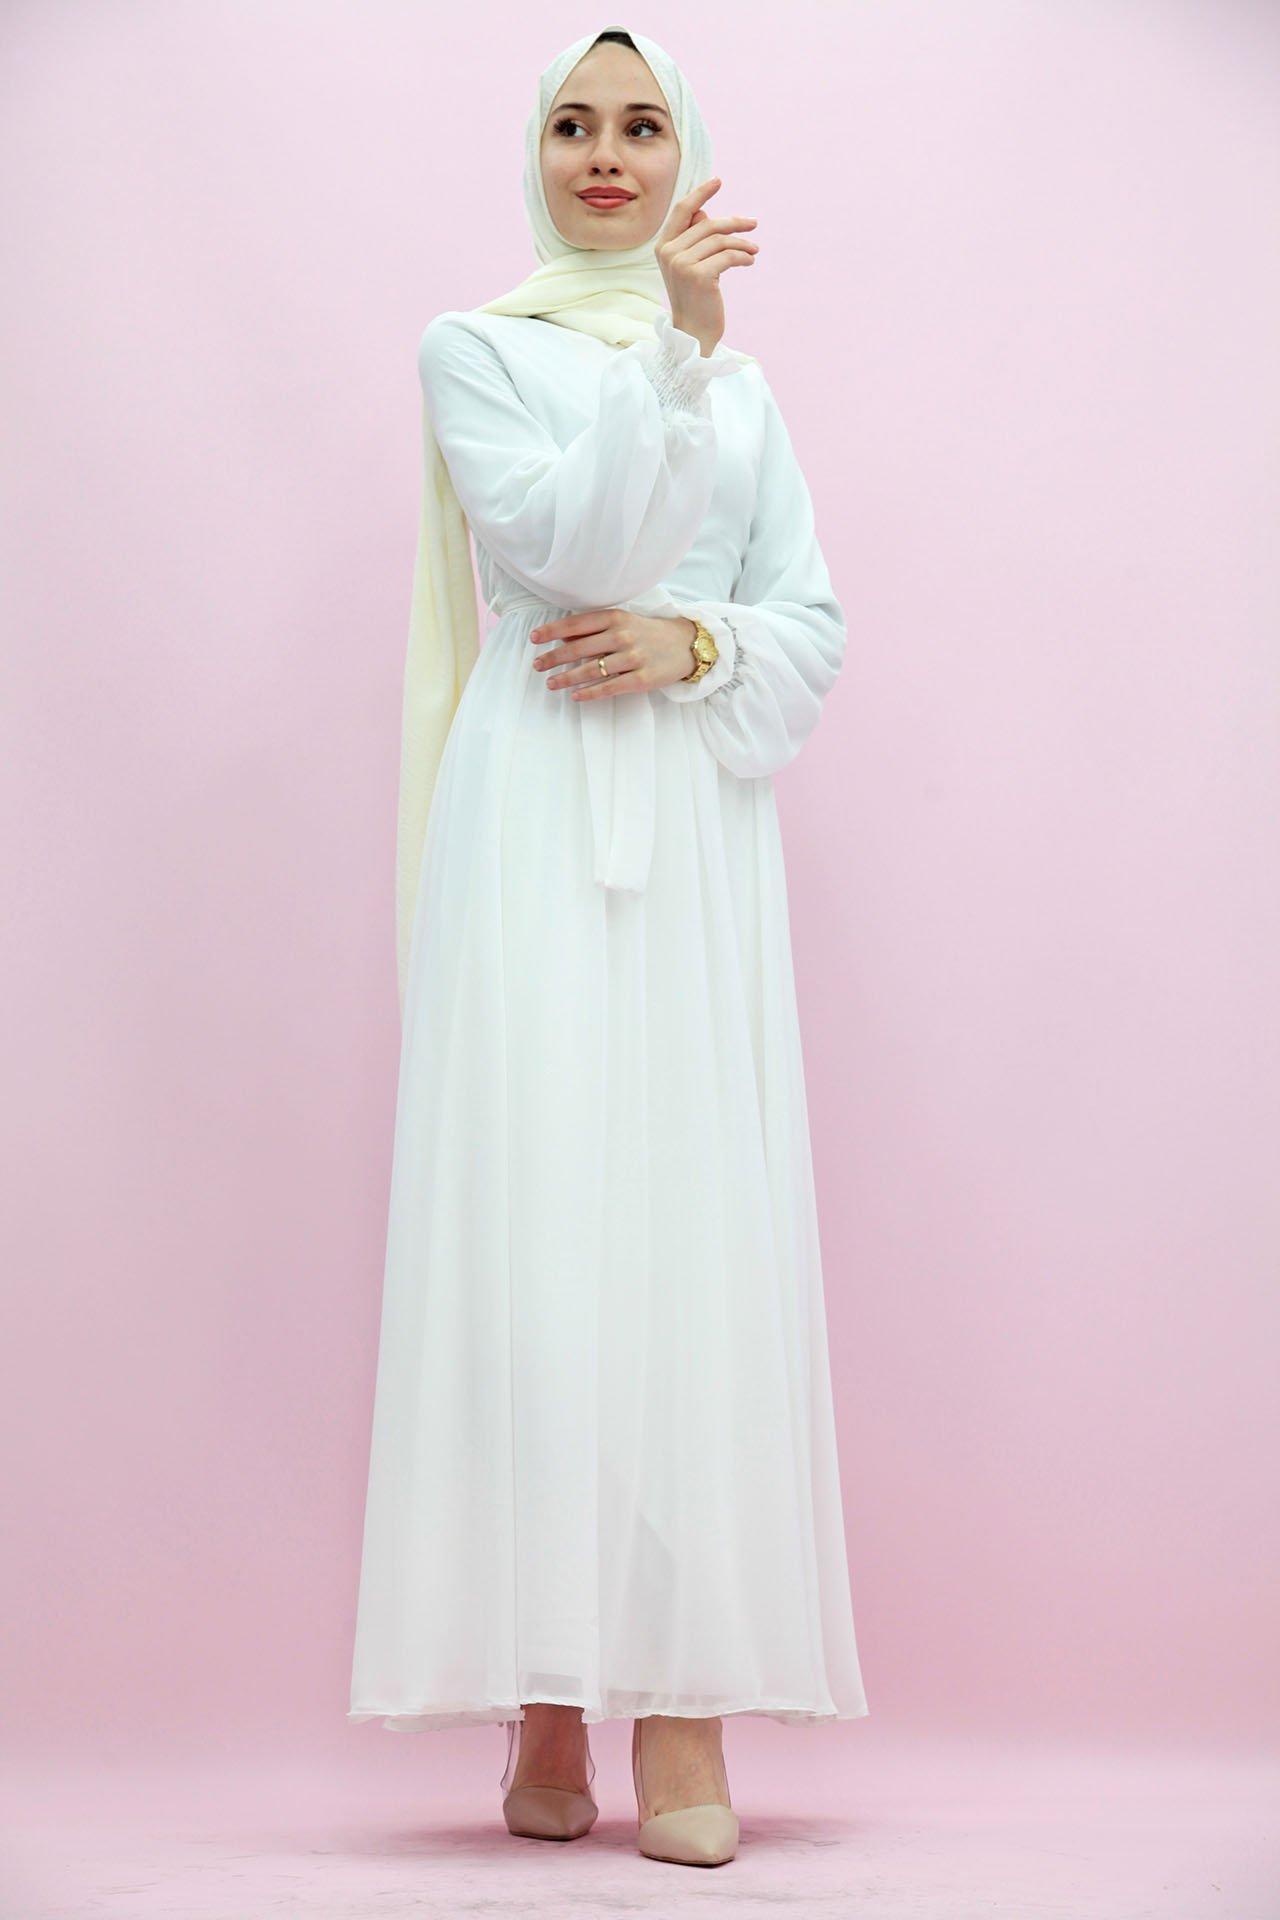 GİZAGİYİM - Bisiklet Yaka Şifon Elbise Beyaz